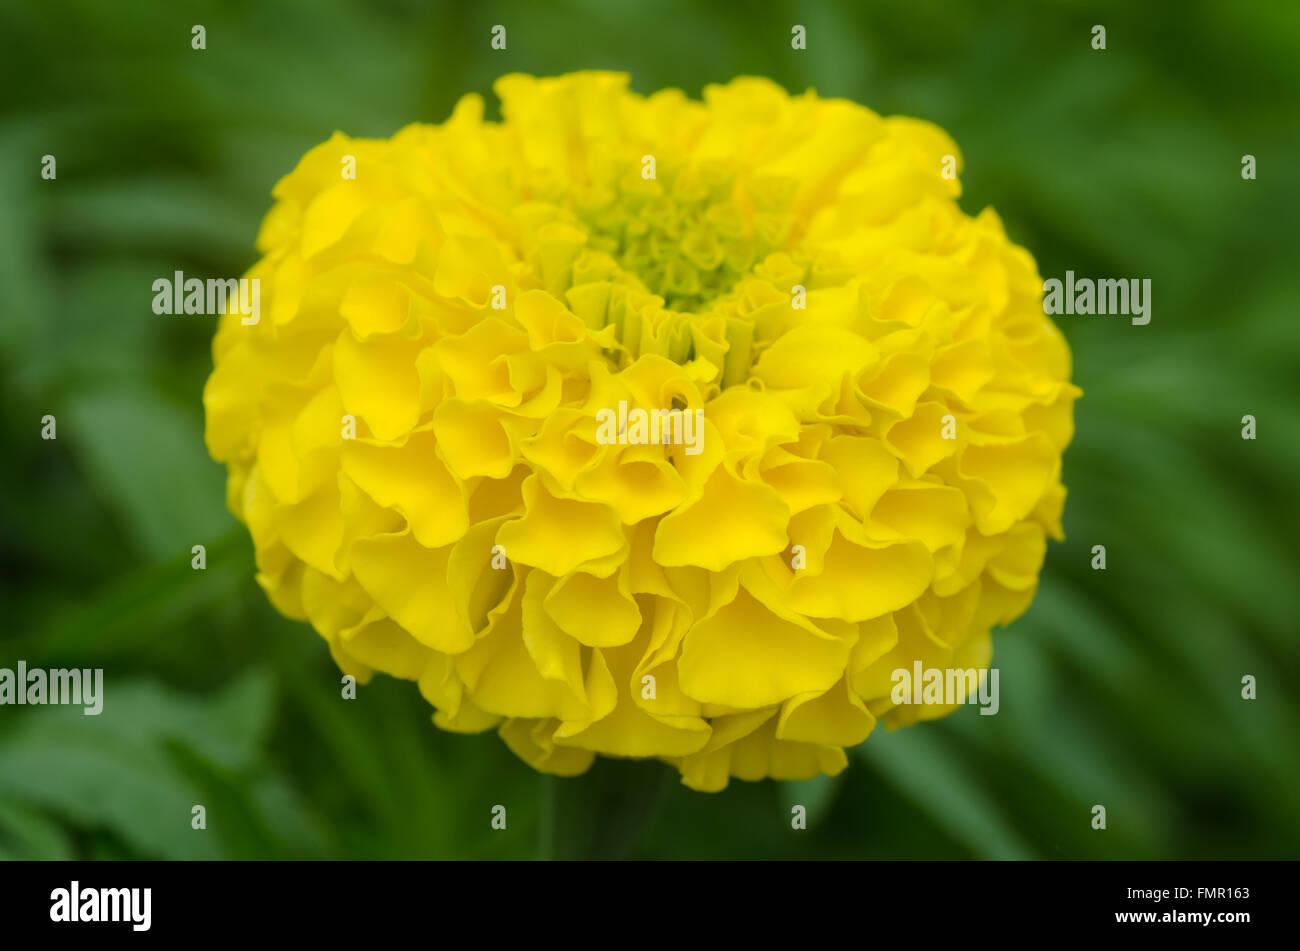 Beautiful golden yellow marigold flower stock photo 98850811 alamy beautiful golden yellow marigold flower mightylinksfo